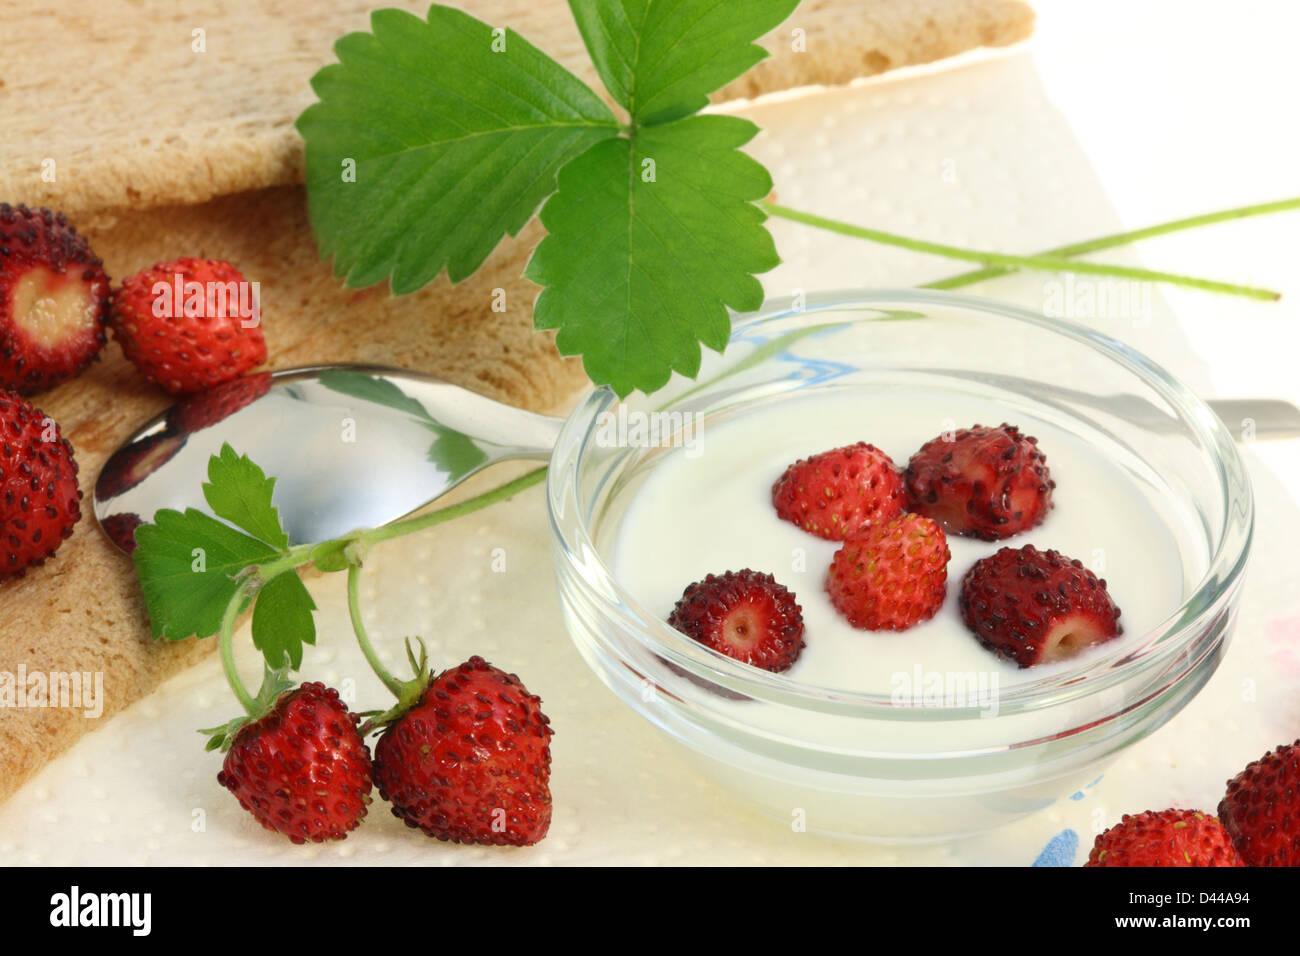 Breakfast with crispbread and wild berries. - Stock Image